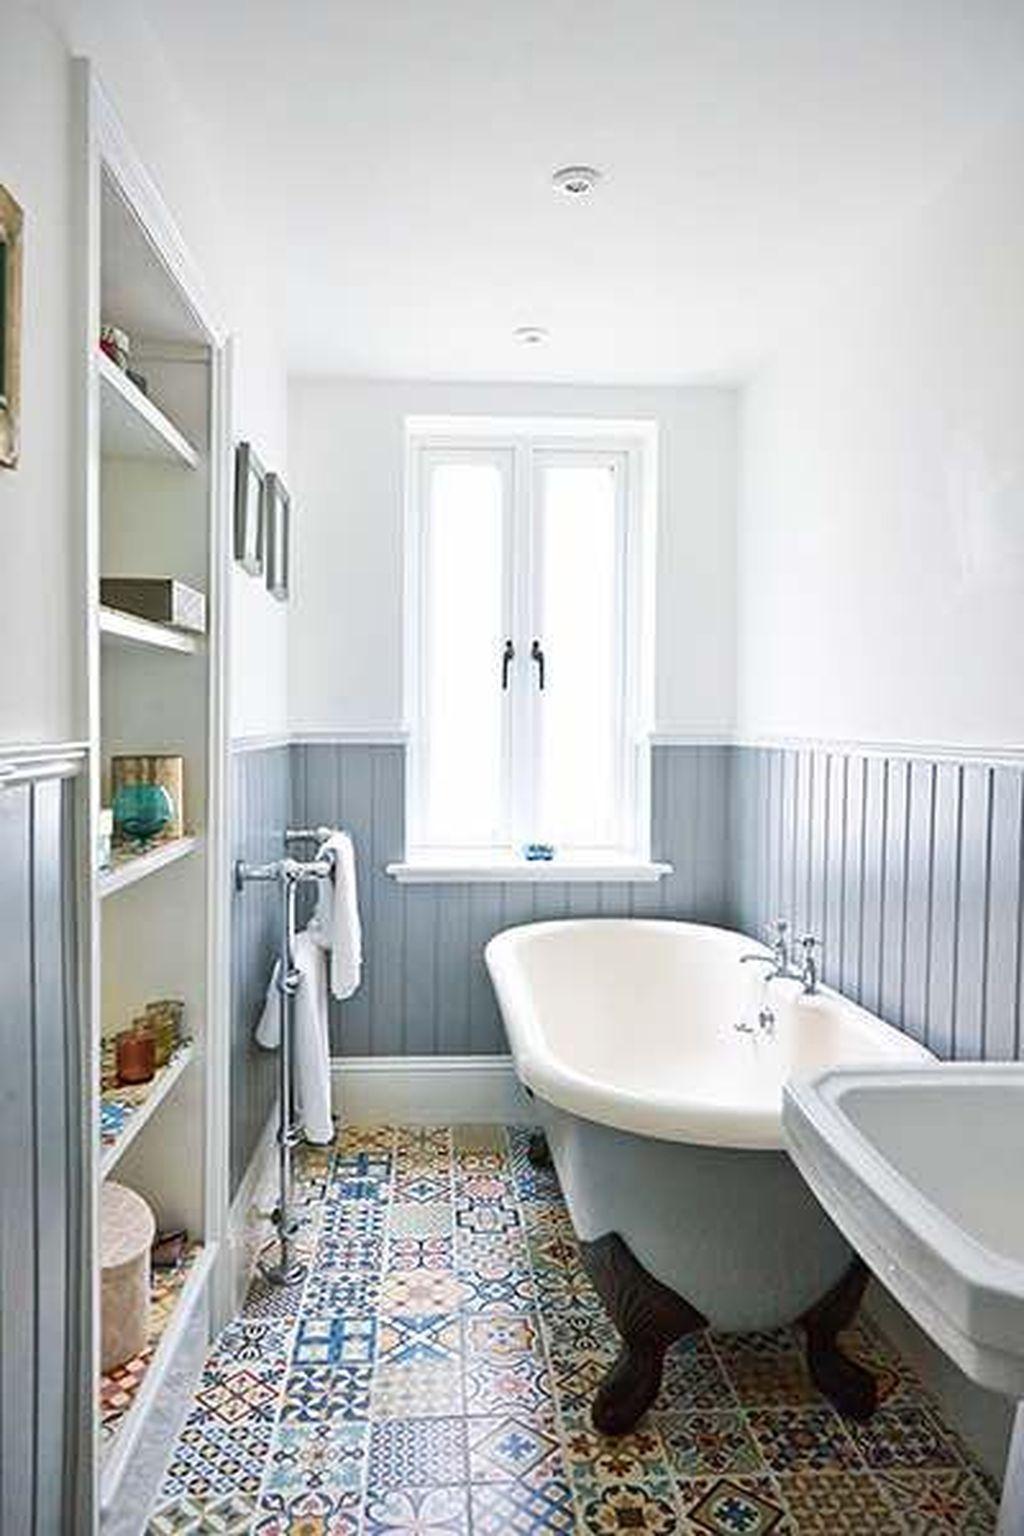 Awesome 40 The Best Small Bathroom Design Ideas | Bathroom ideas ...